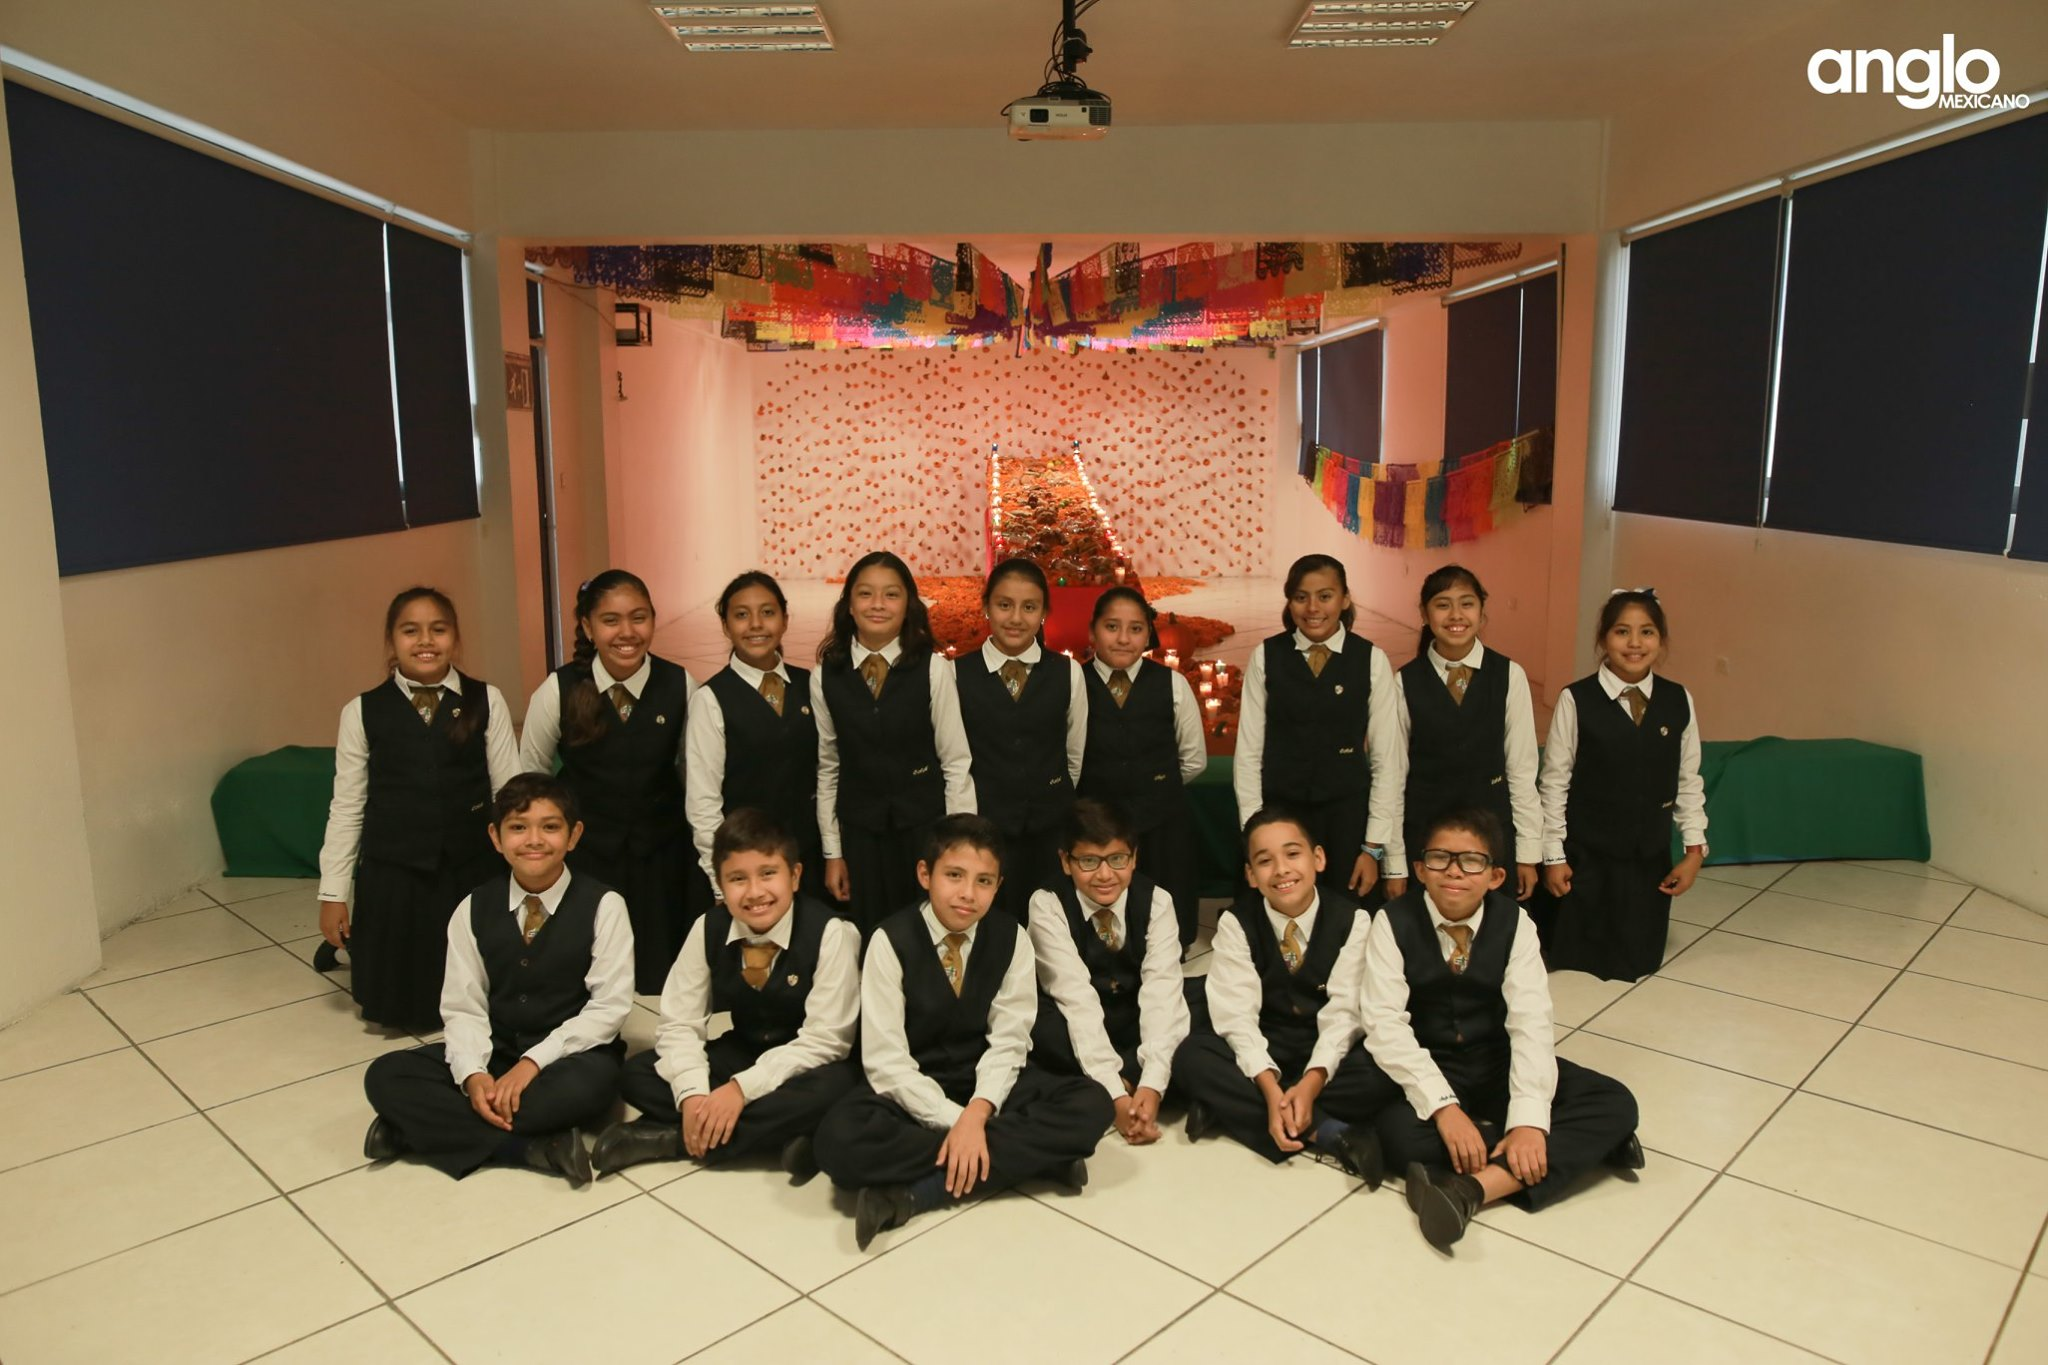 ANGLO MEXICANO DE COATZACOALCOS-VISITA-ALTARES-004